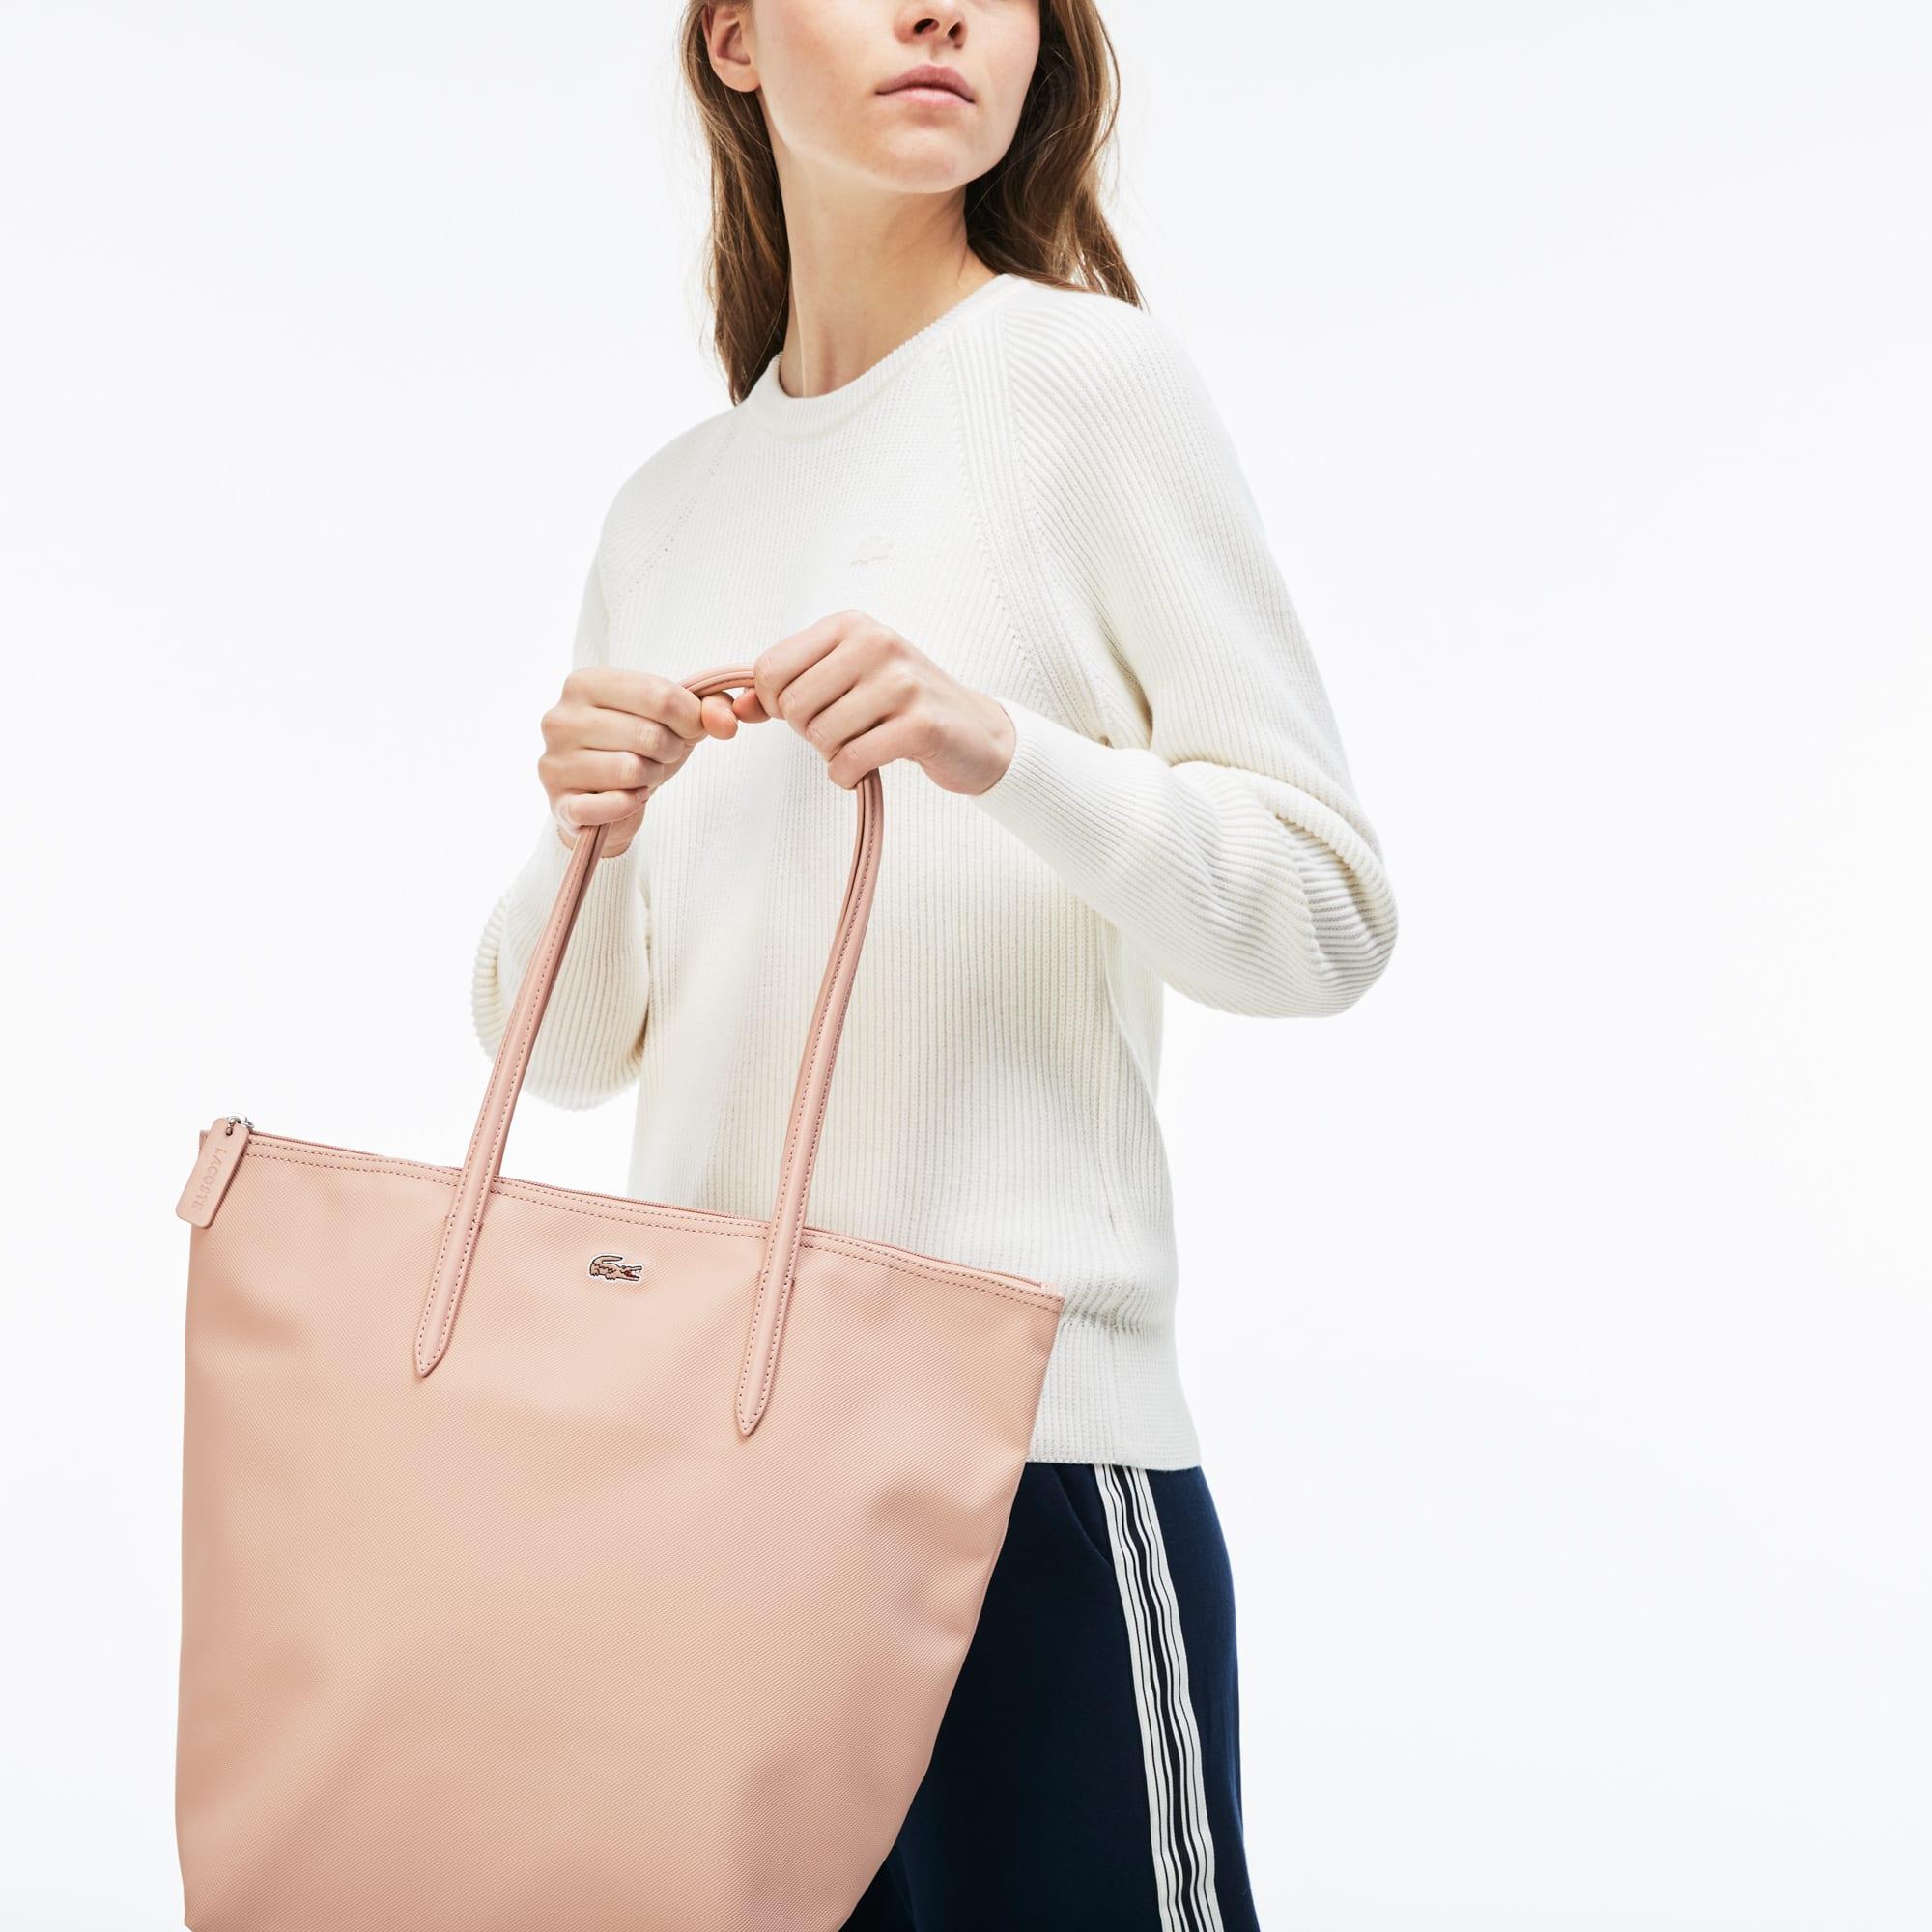 Women's L.12.12 Concept Vertical Zip Tote Bag